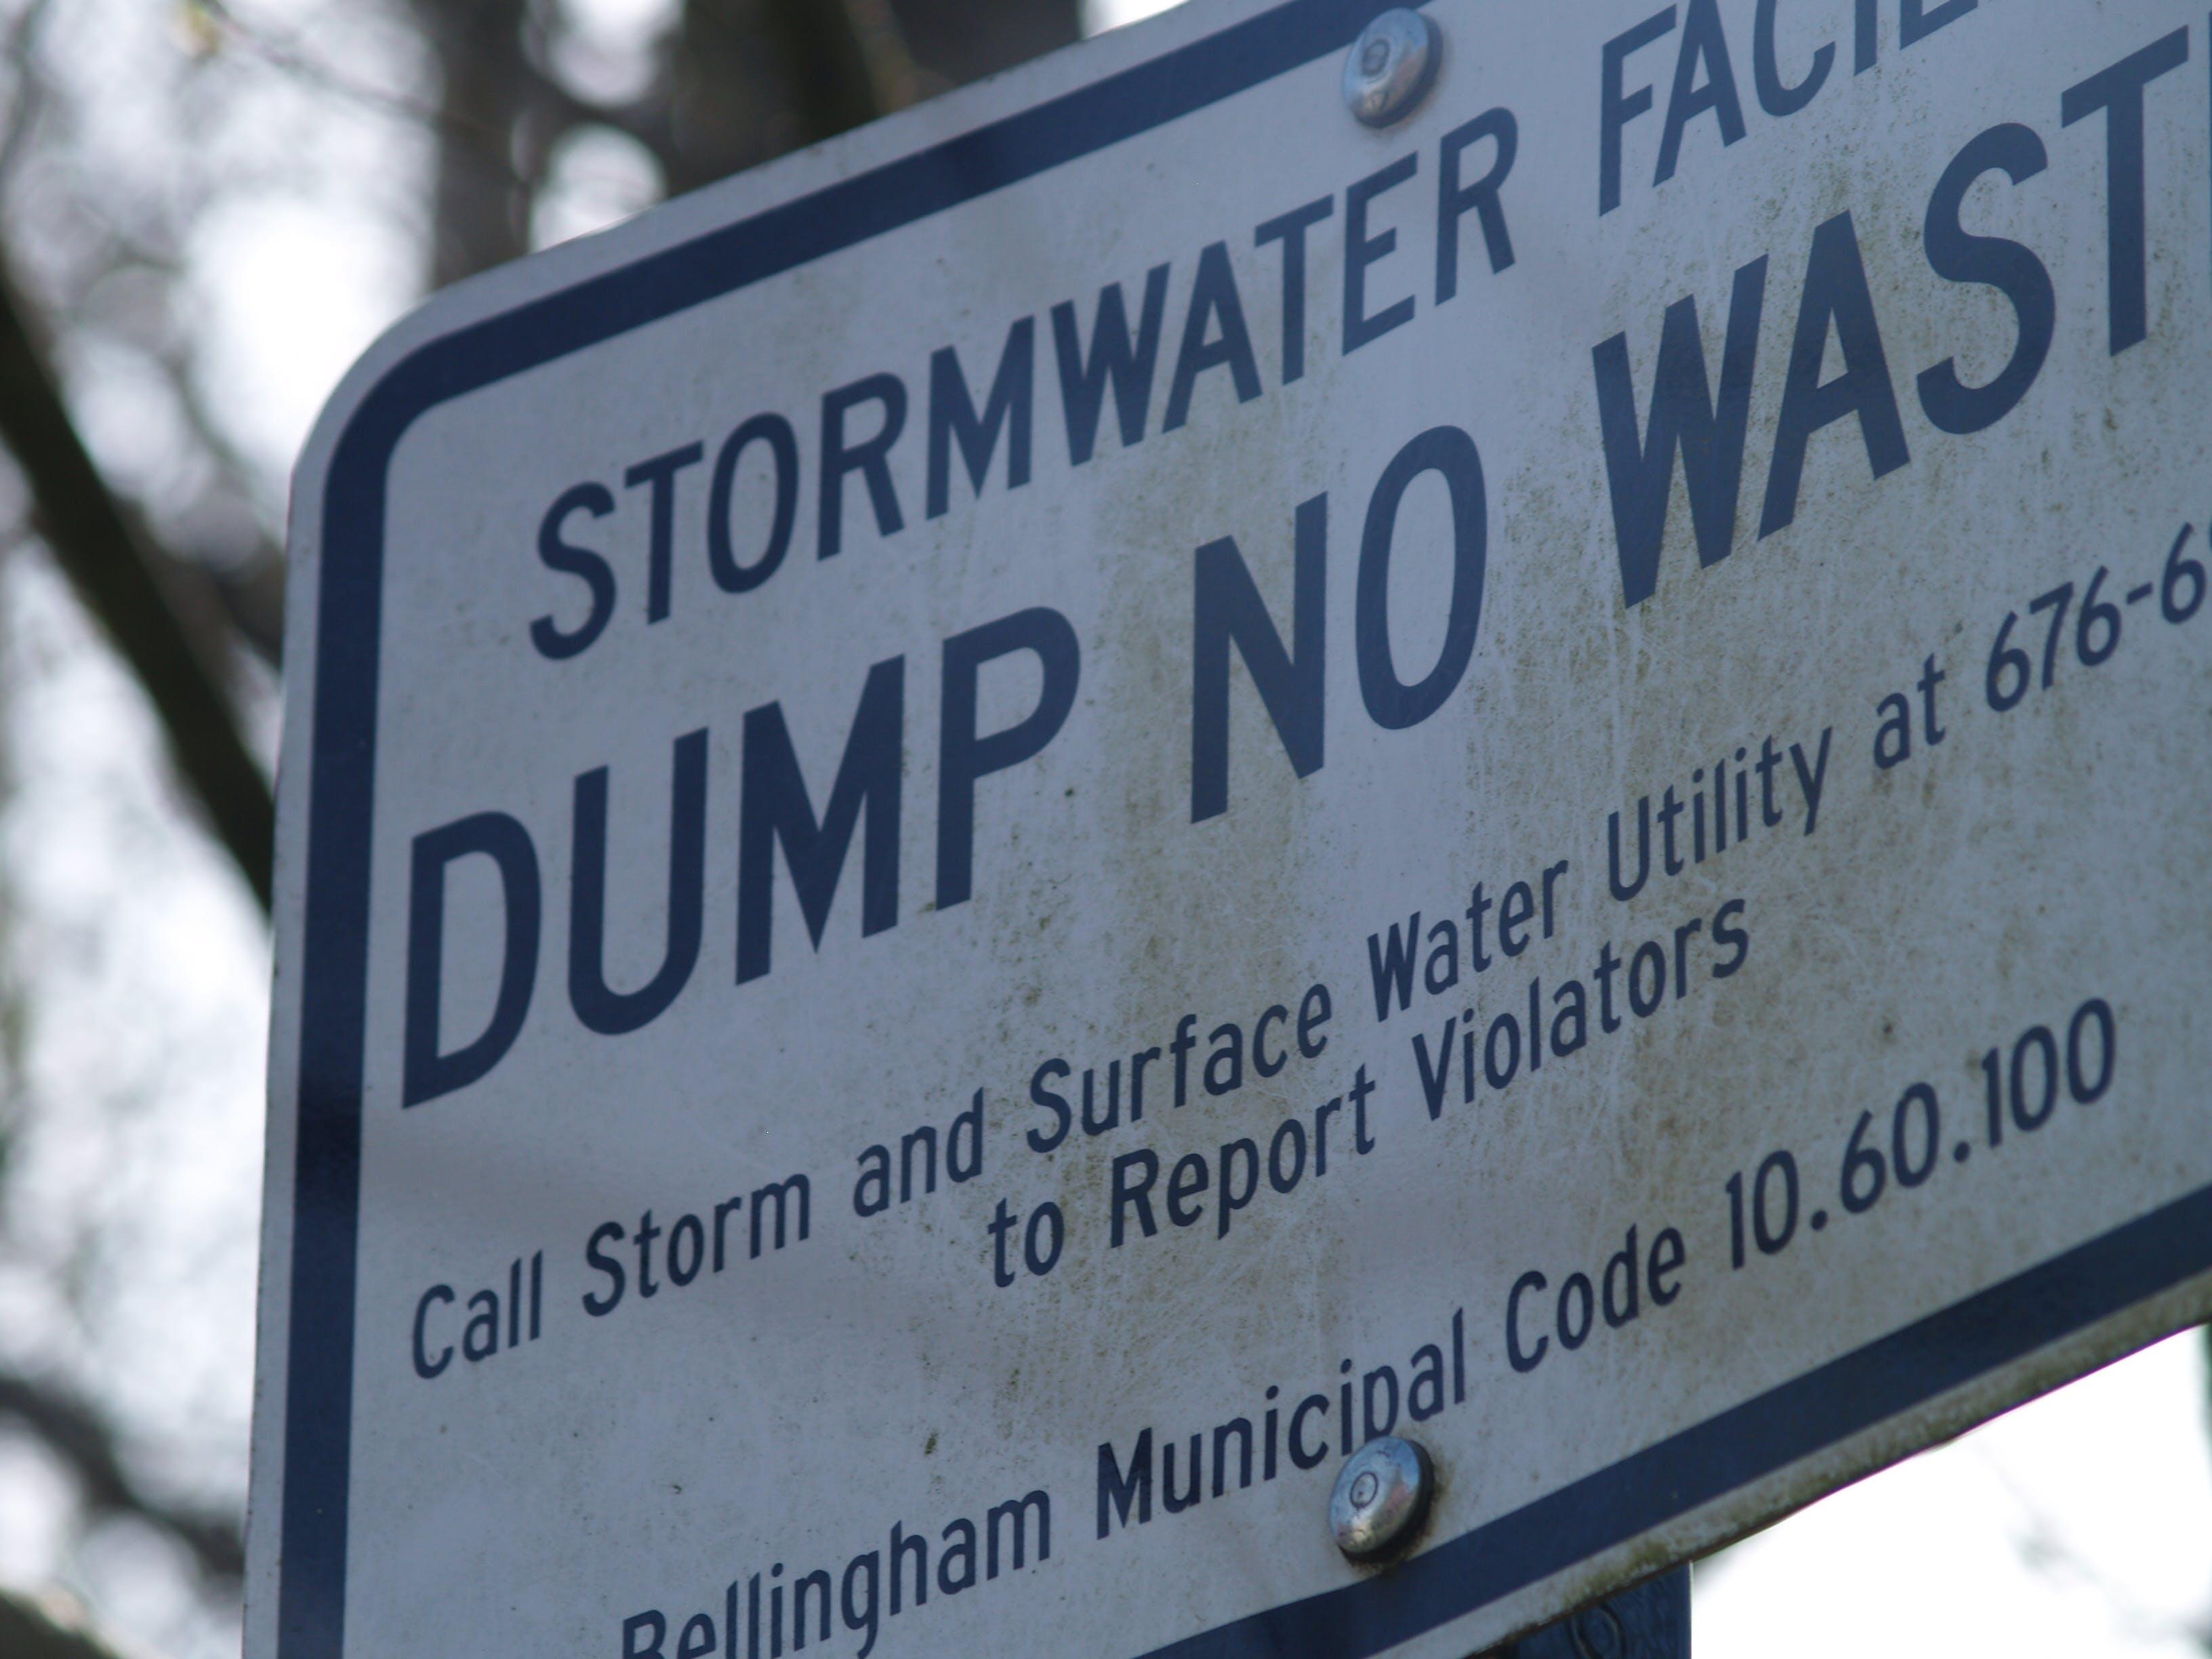 Dump No Waste Sign 2008